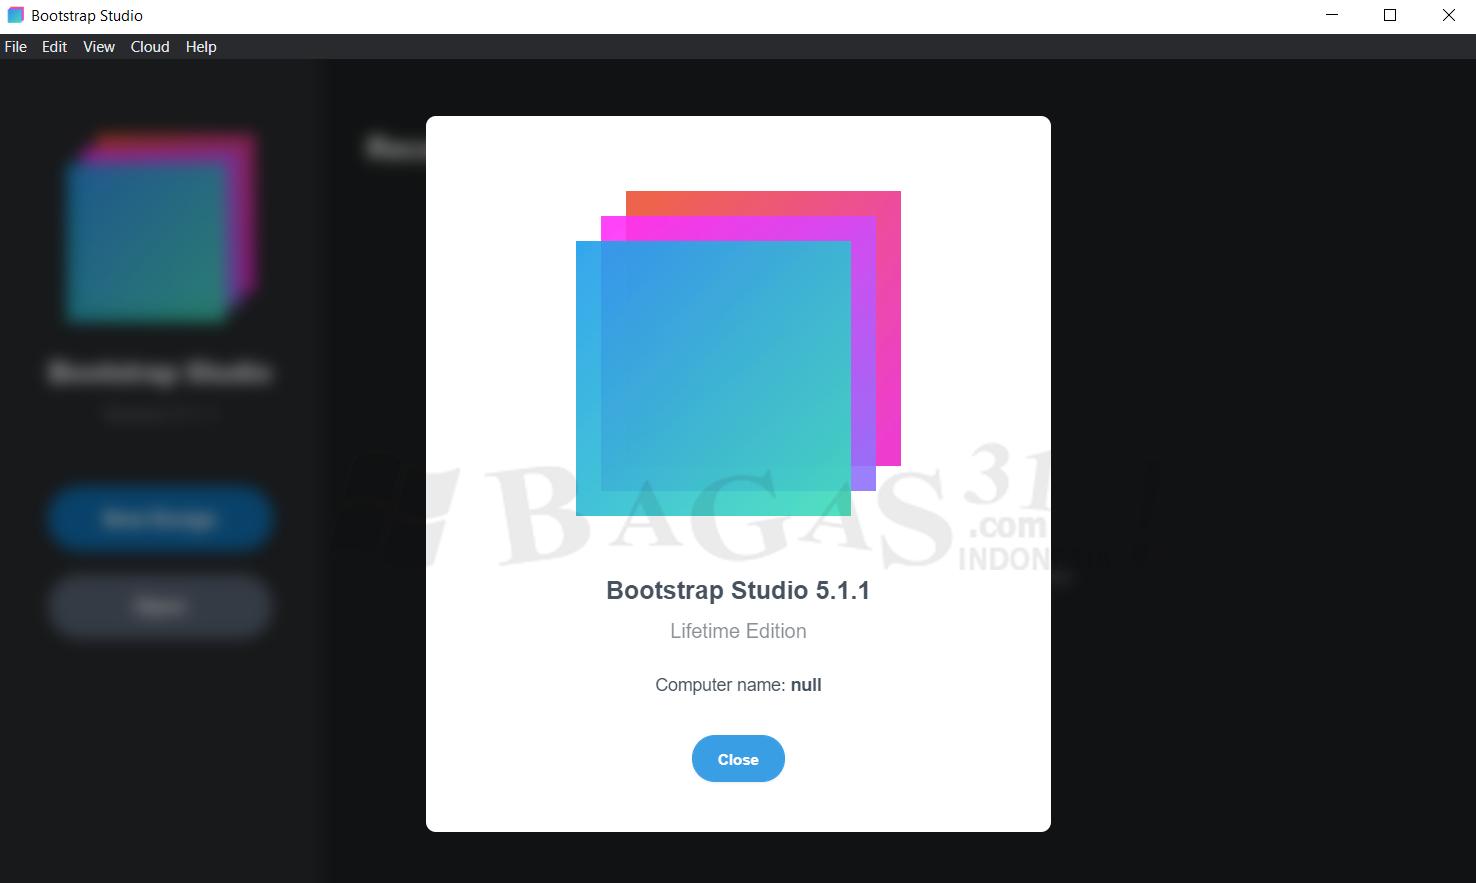 Bootstrap Studio 5.1.1 Full Version